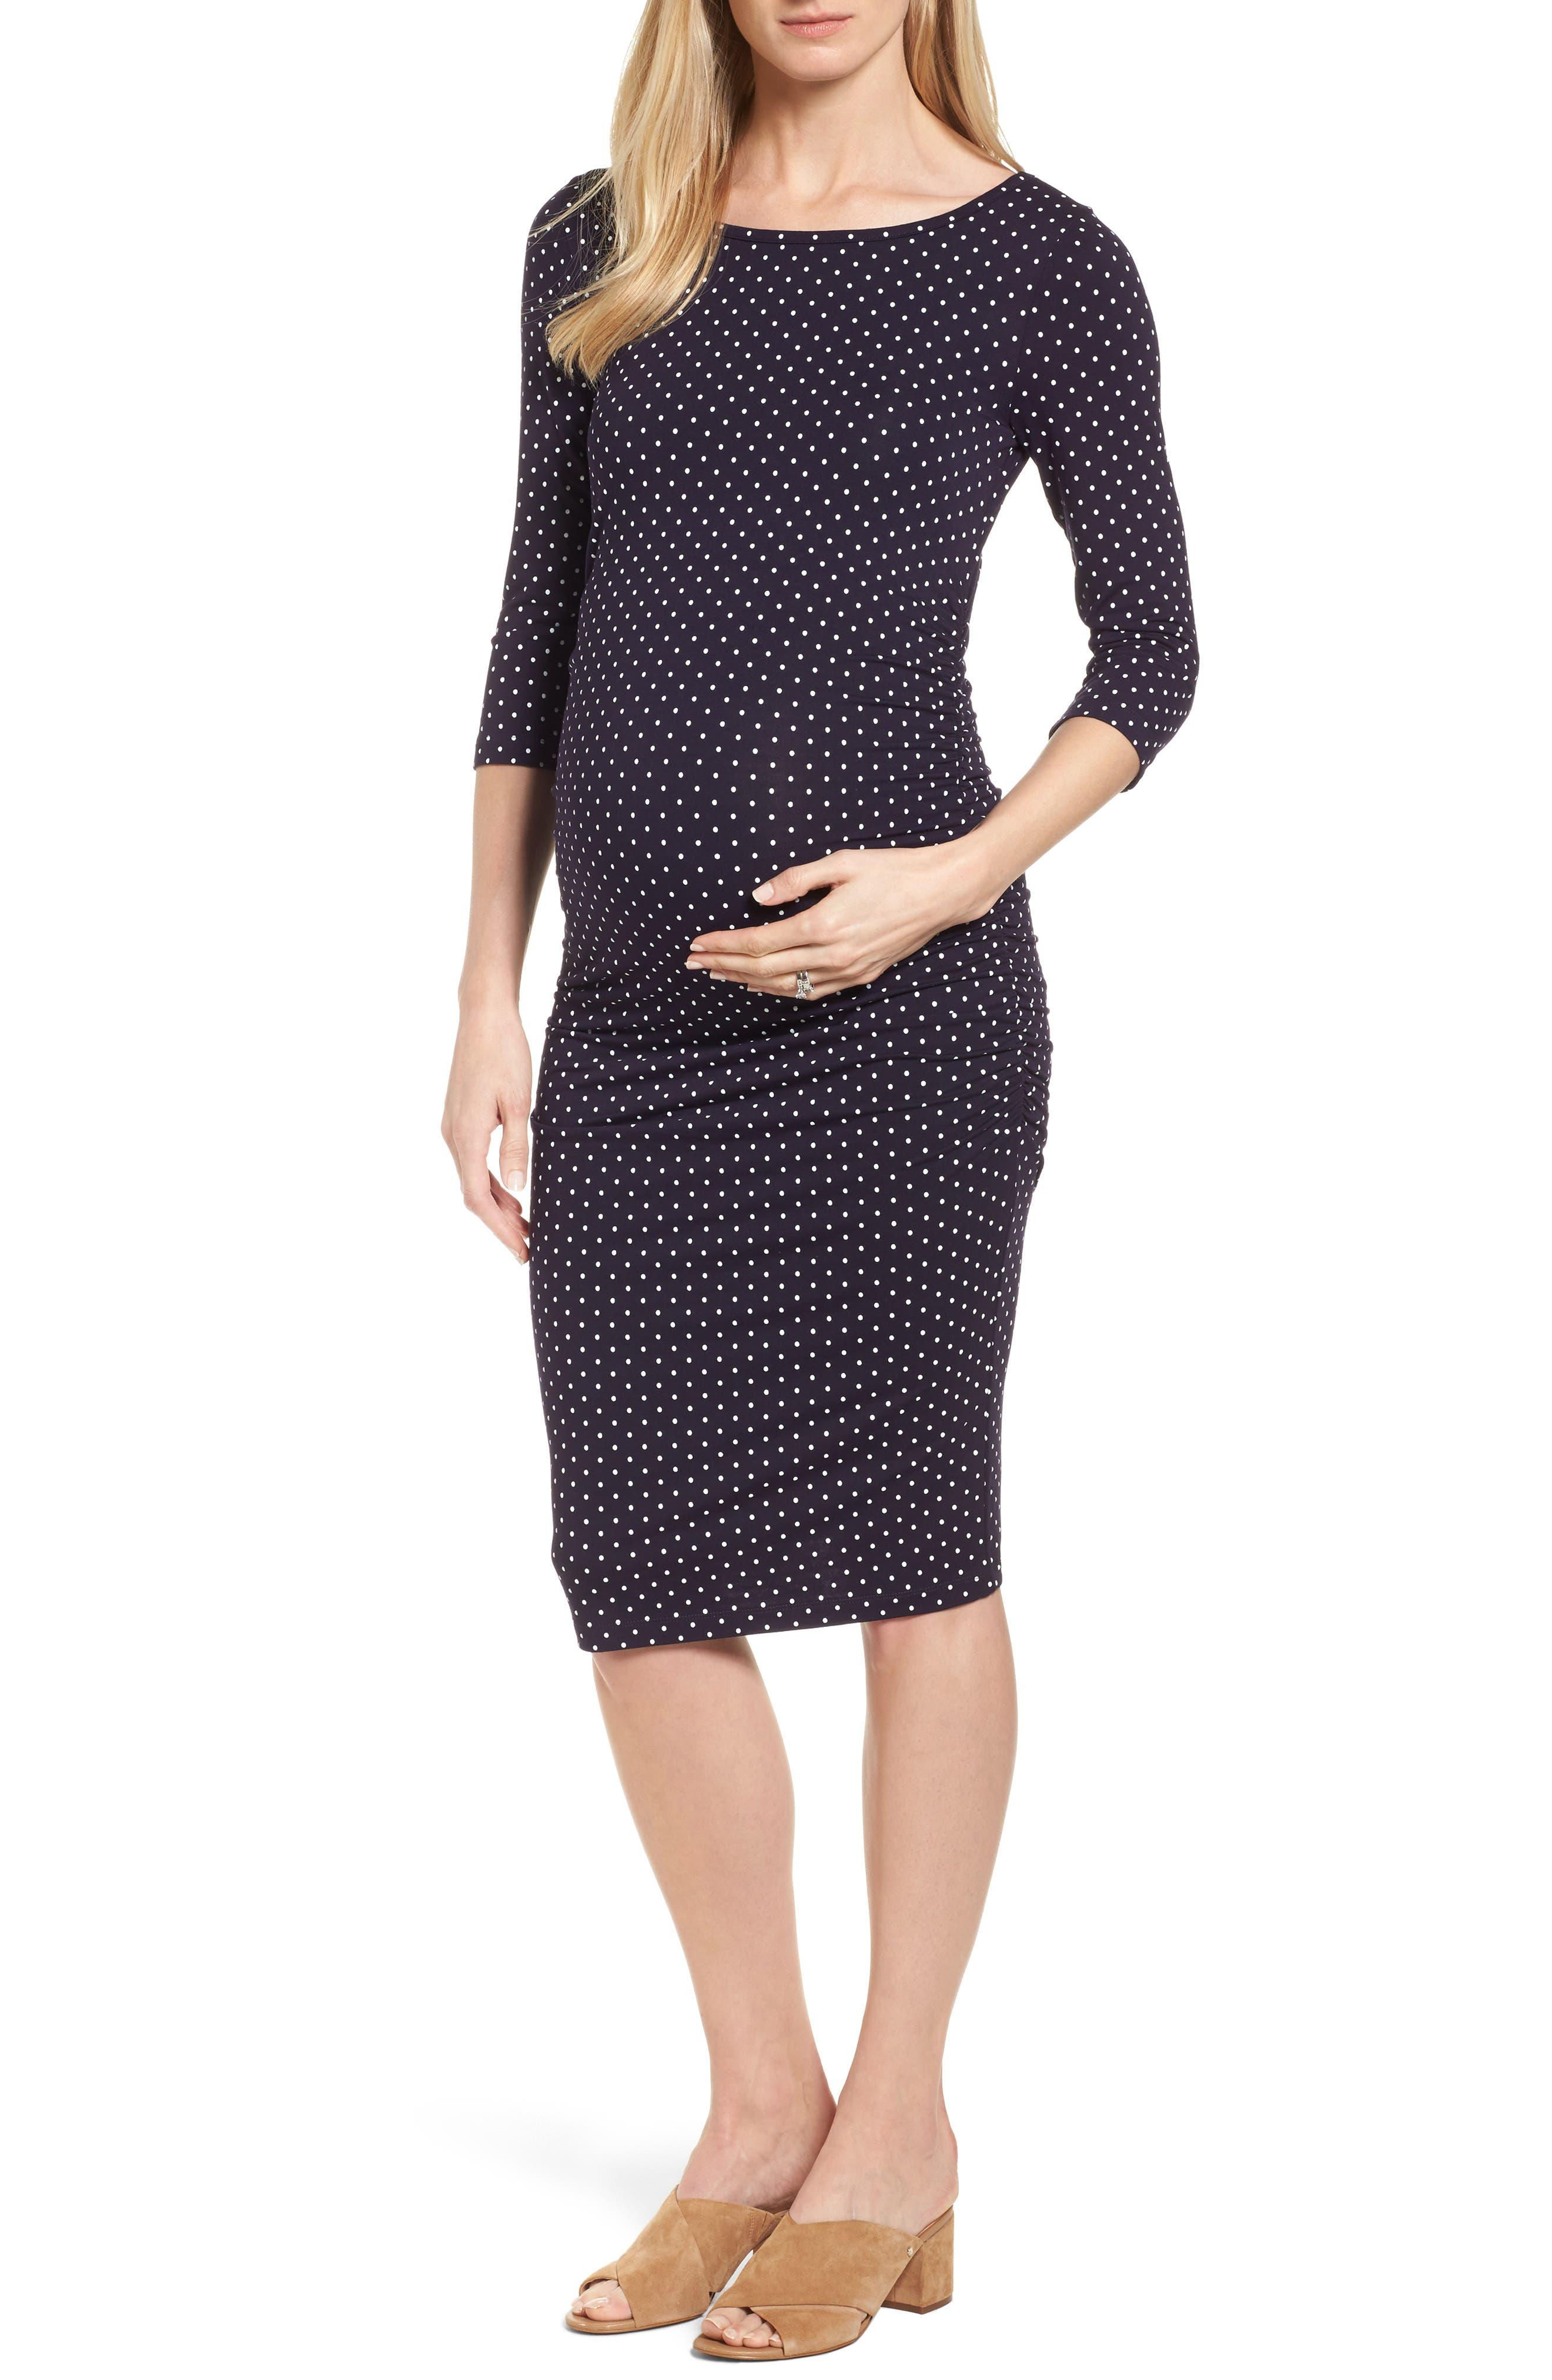 Jennifer Dot Ruched Maternity Dress,                         Main,                         color, NAVY POLKA PRINT